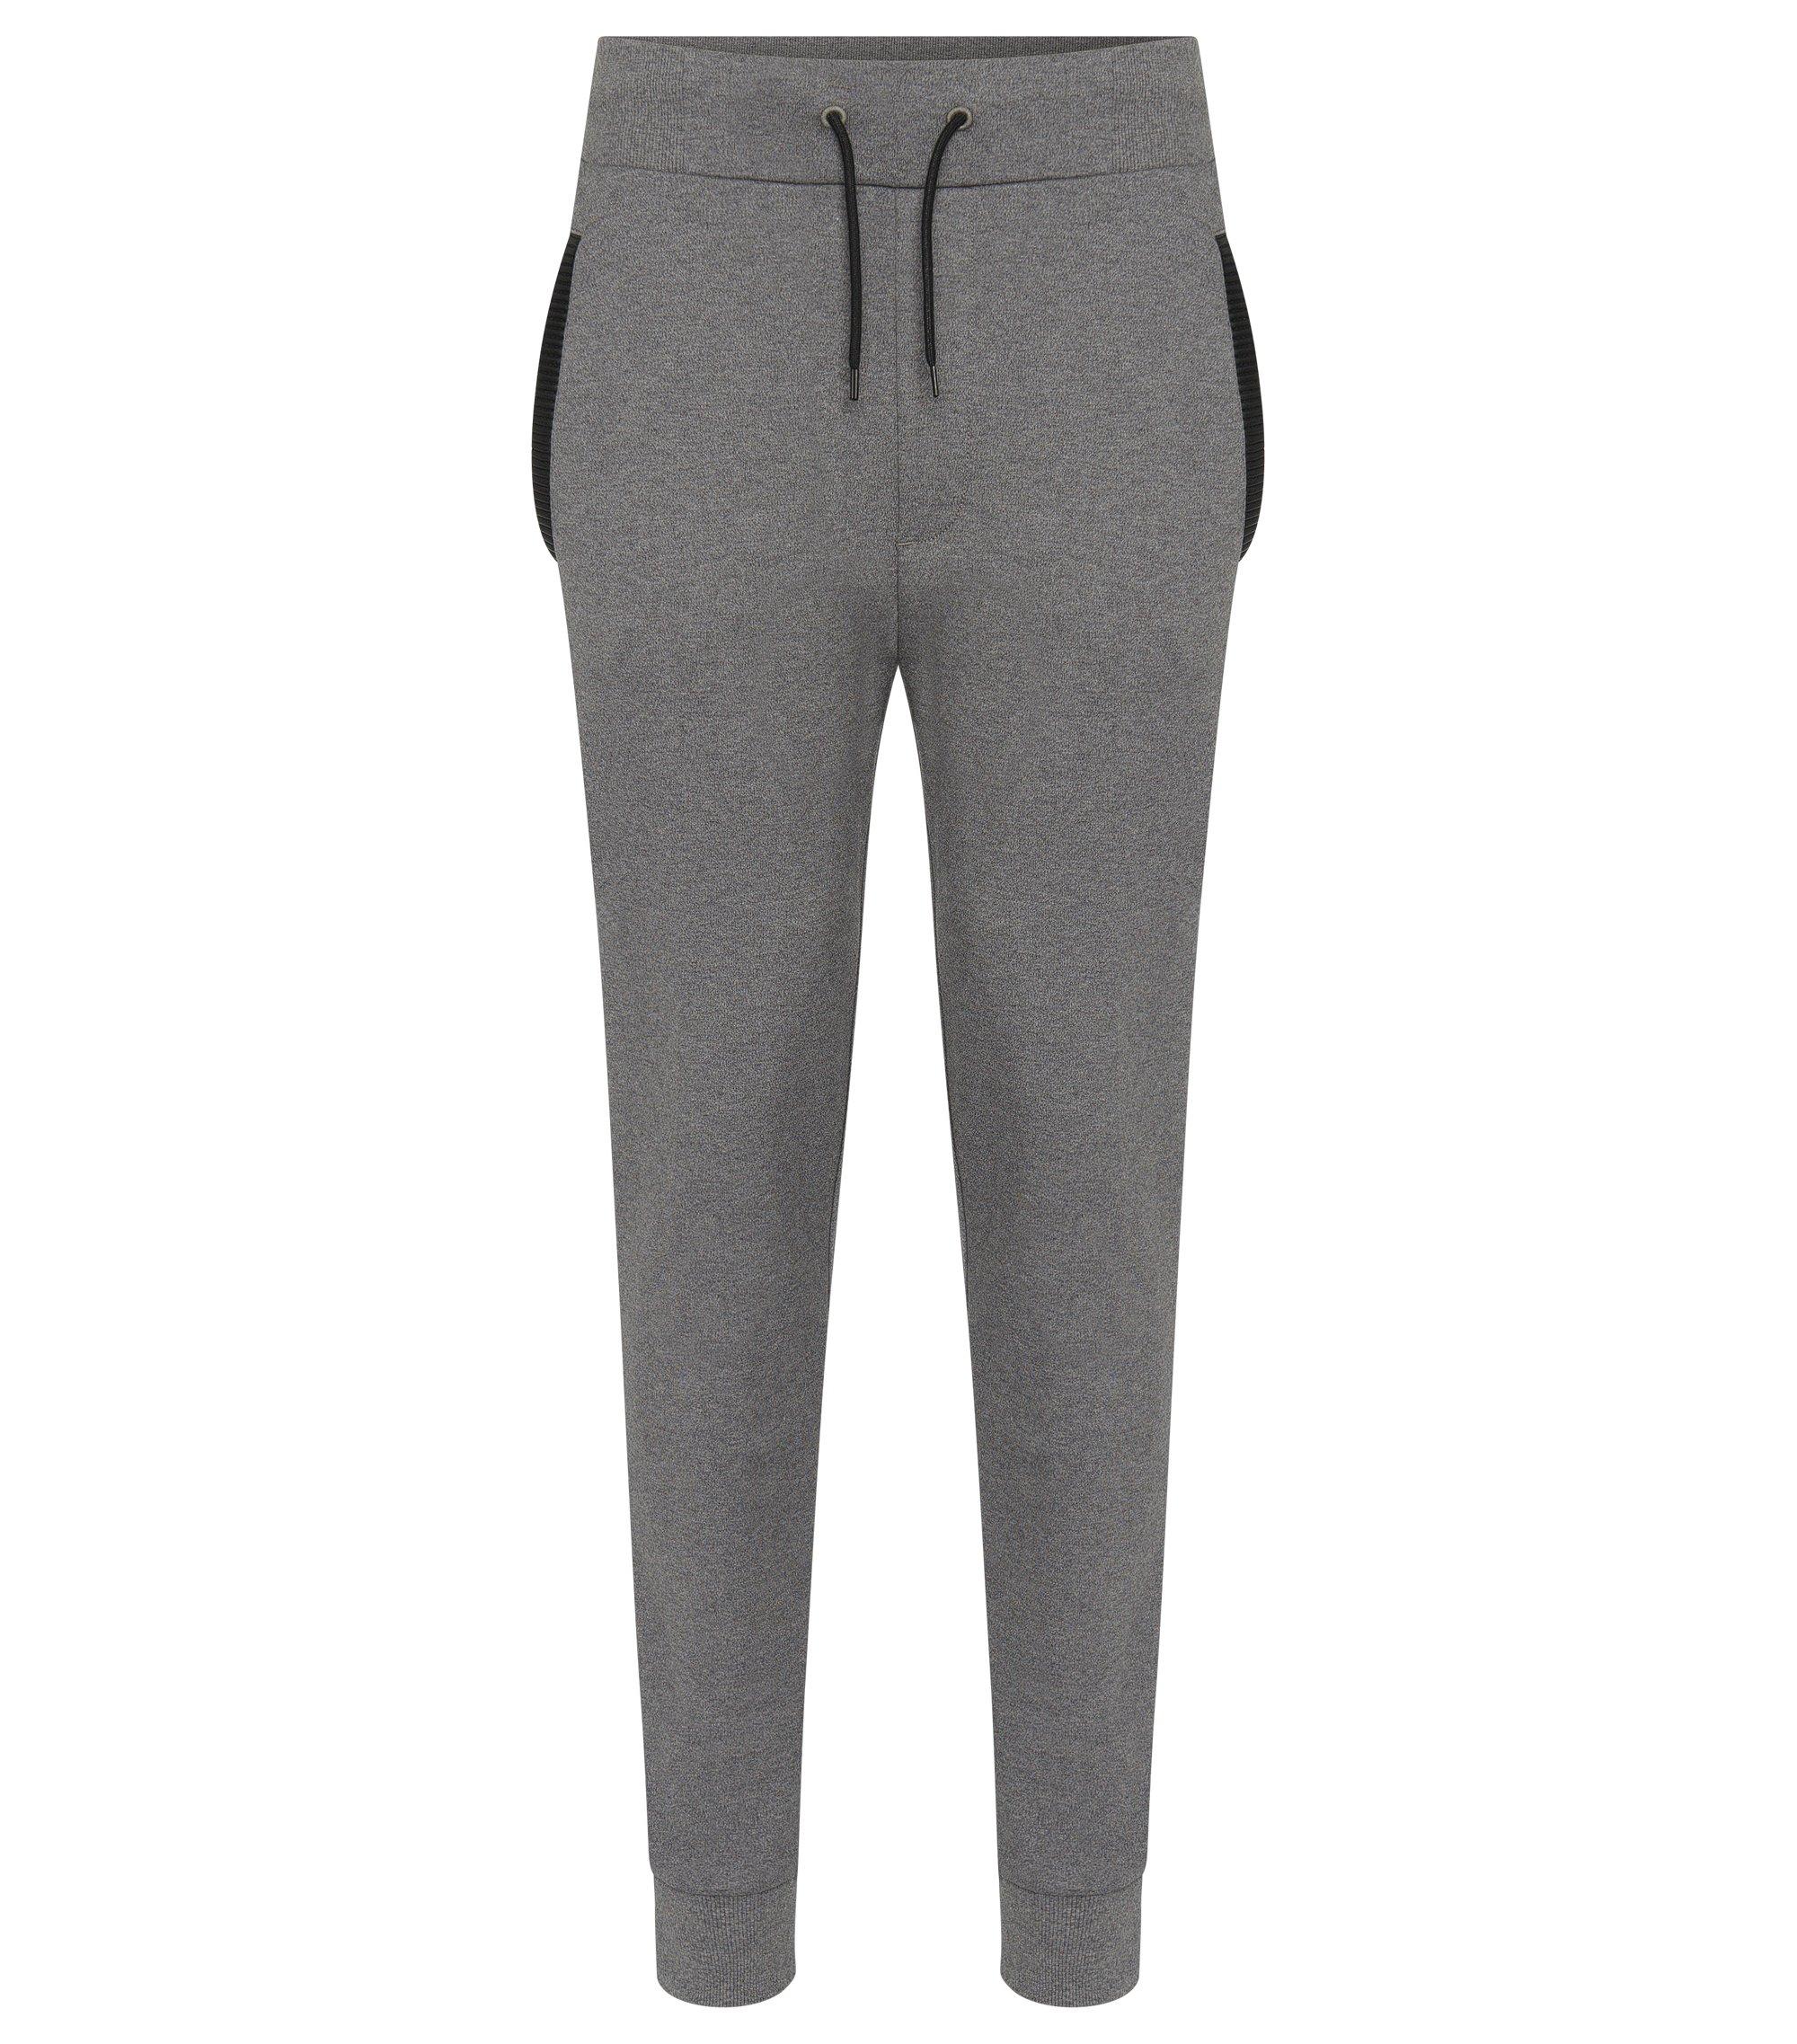 Cotton Drawstring Sweatpant | Drontier, Open Grey